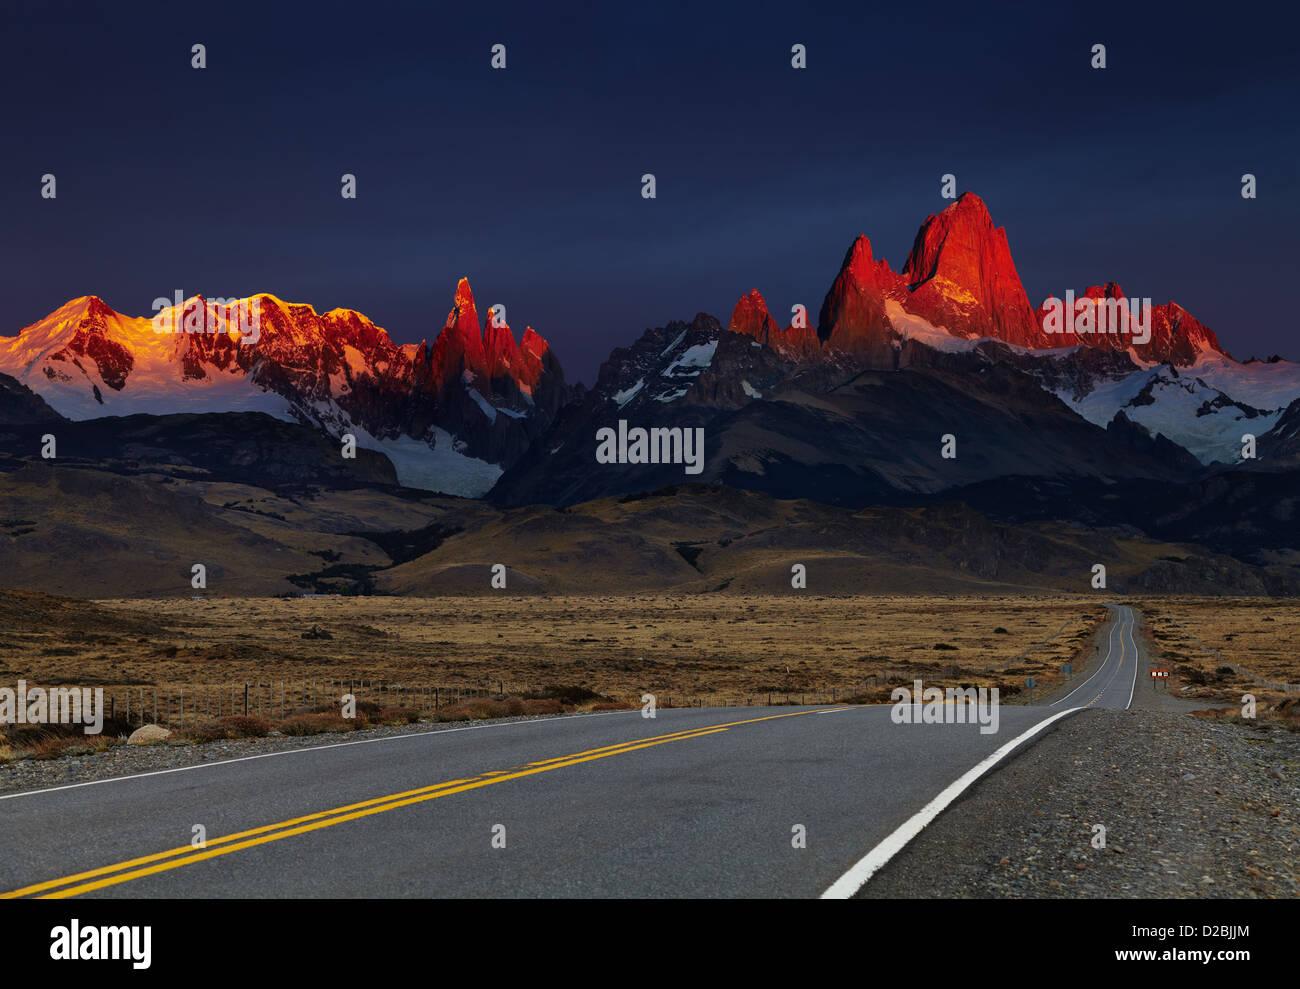 Mount Fitz Roy at sunrise, alpenglow. Los Glaciares National Park, Patagonia, Argentina - Stock Image